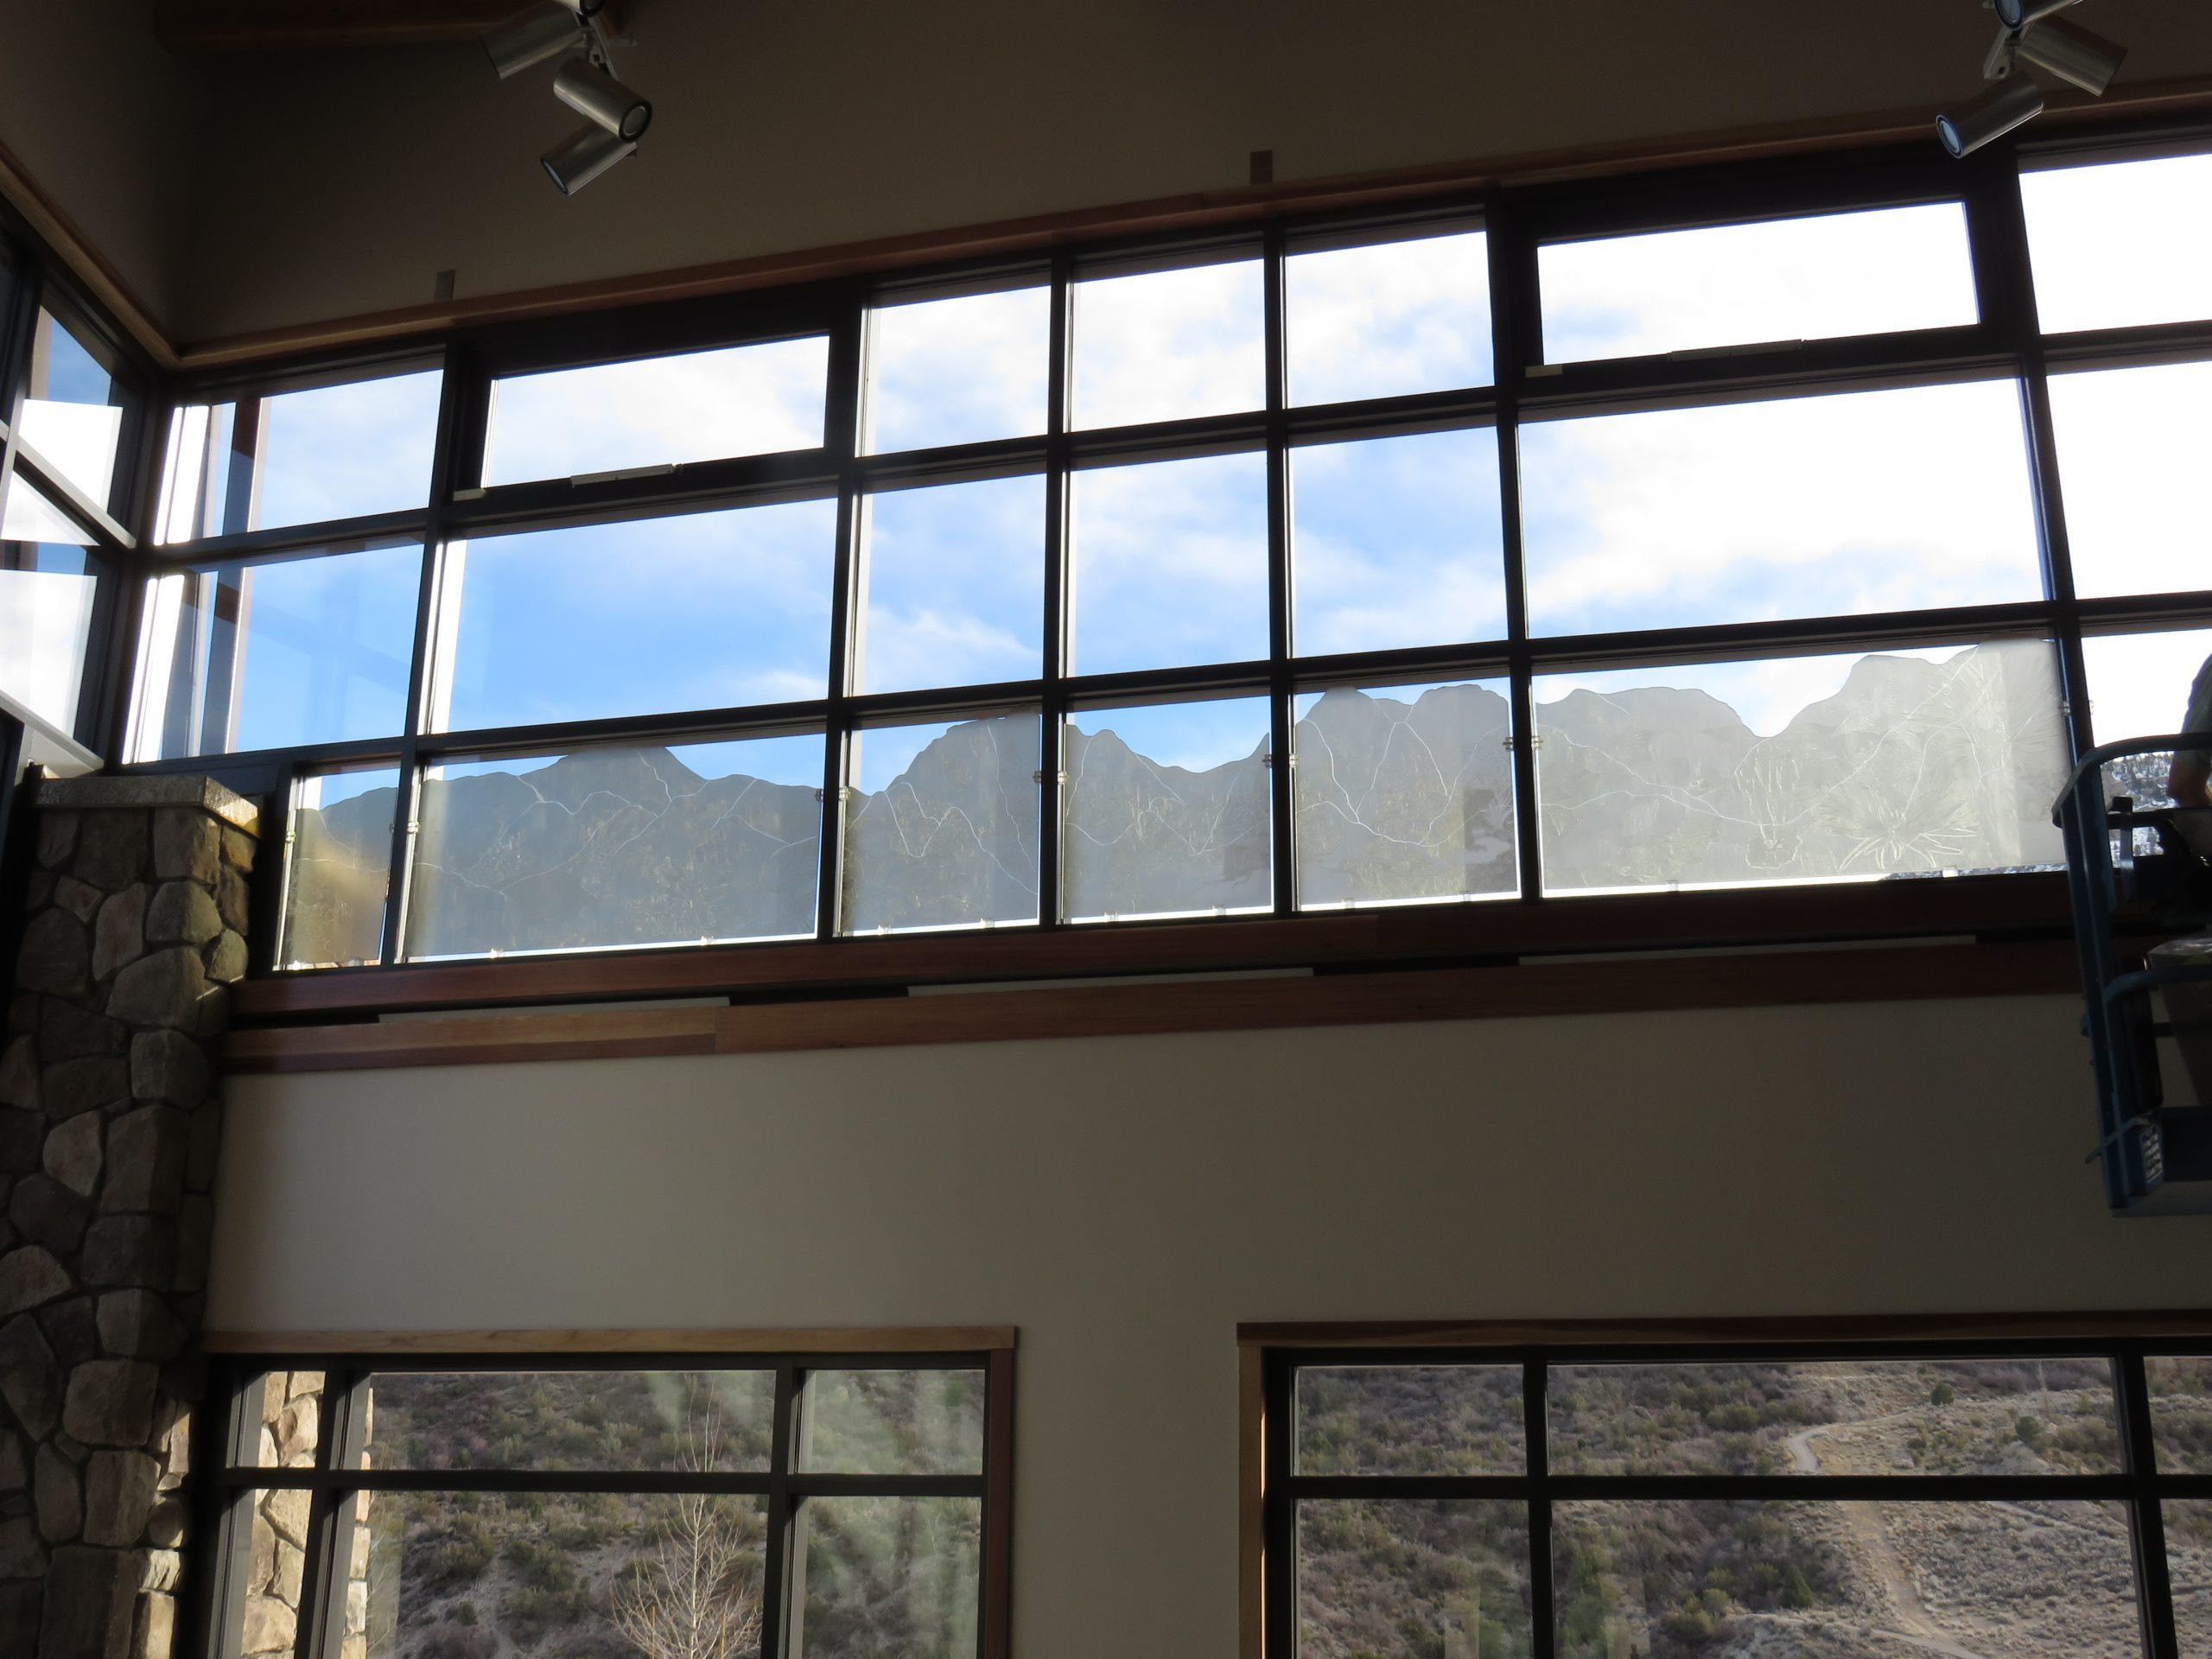 Spring Mountains Visitor Gateway Interactive Polarized Light Window Installation - CODAworx